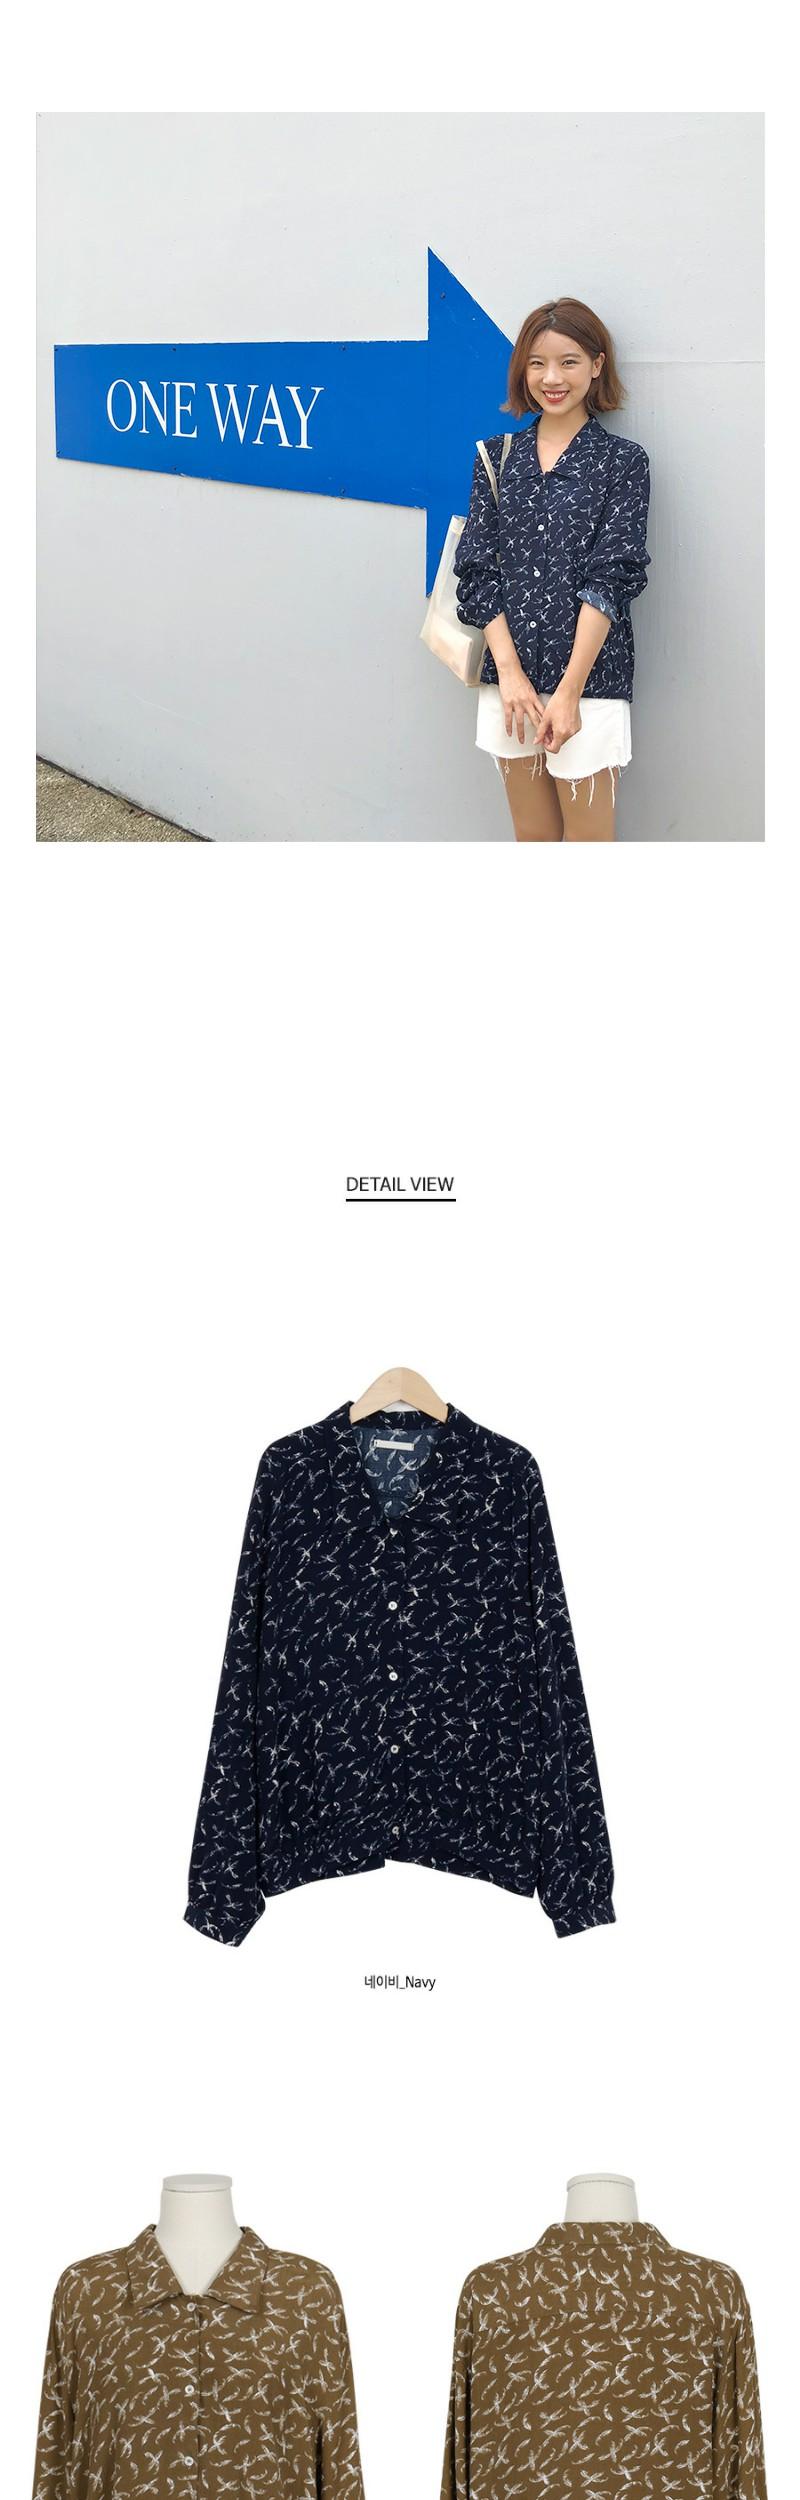 Vacance blouson blouse_S (size : free)